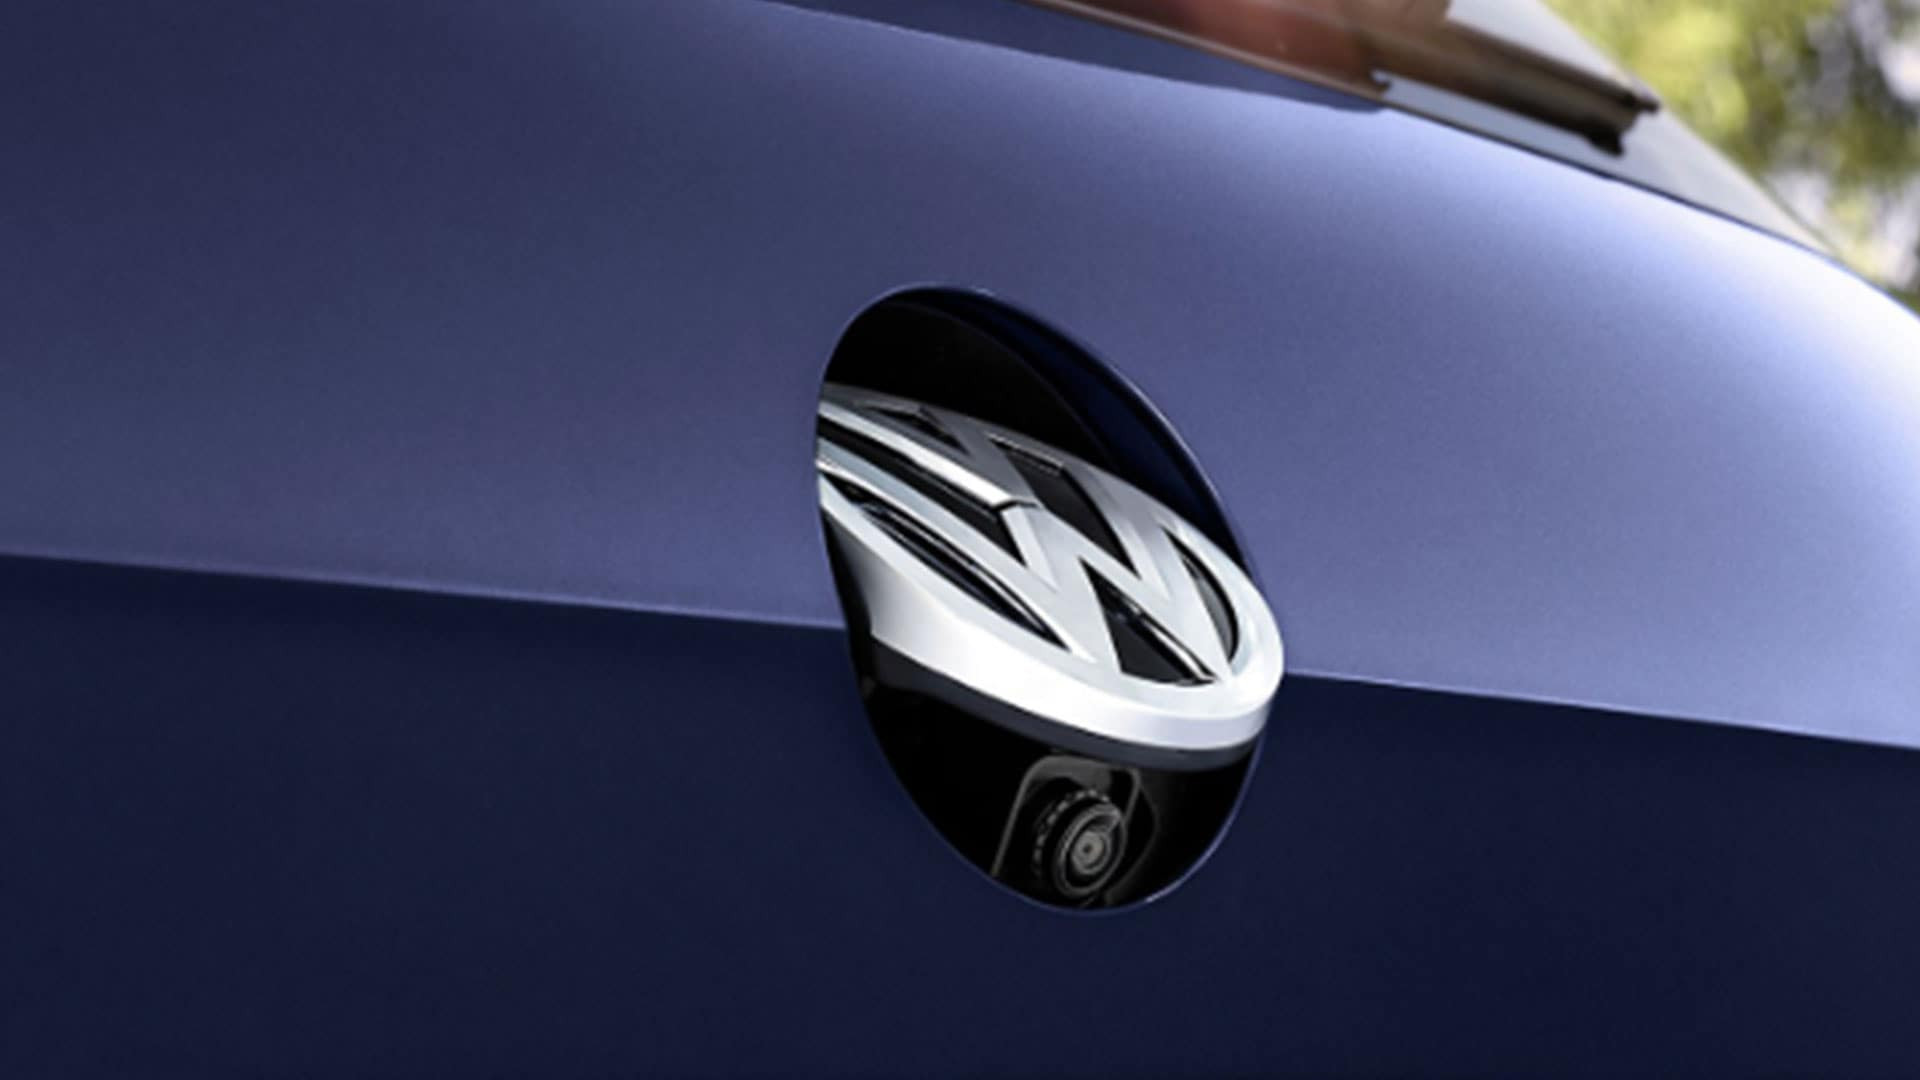 2019 VW e-Golf rearview camera